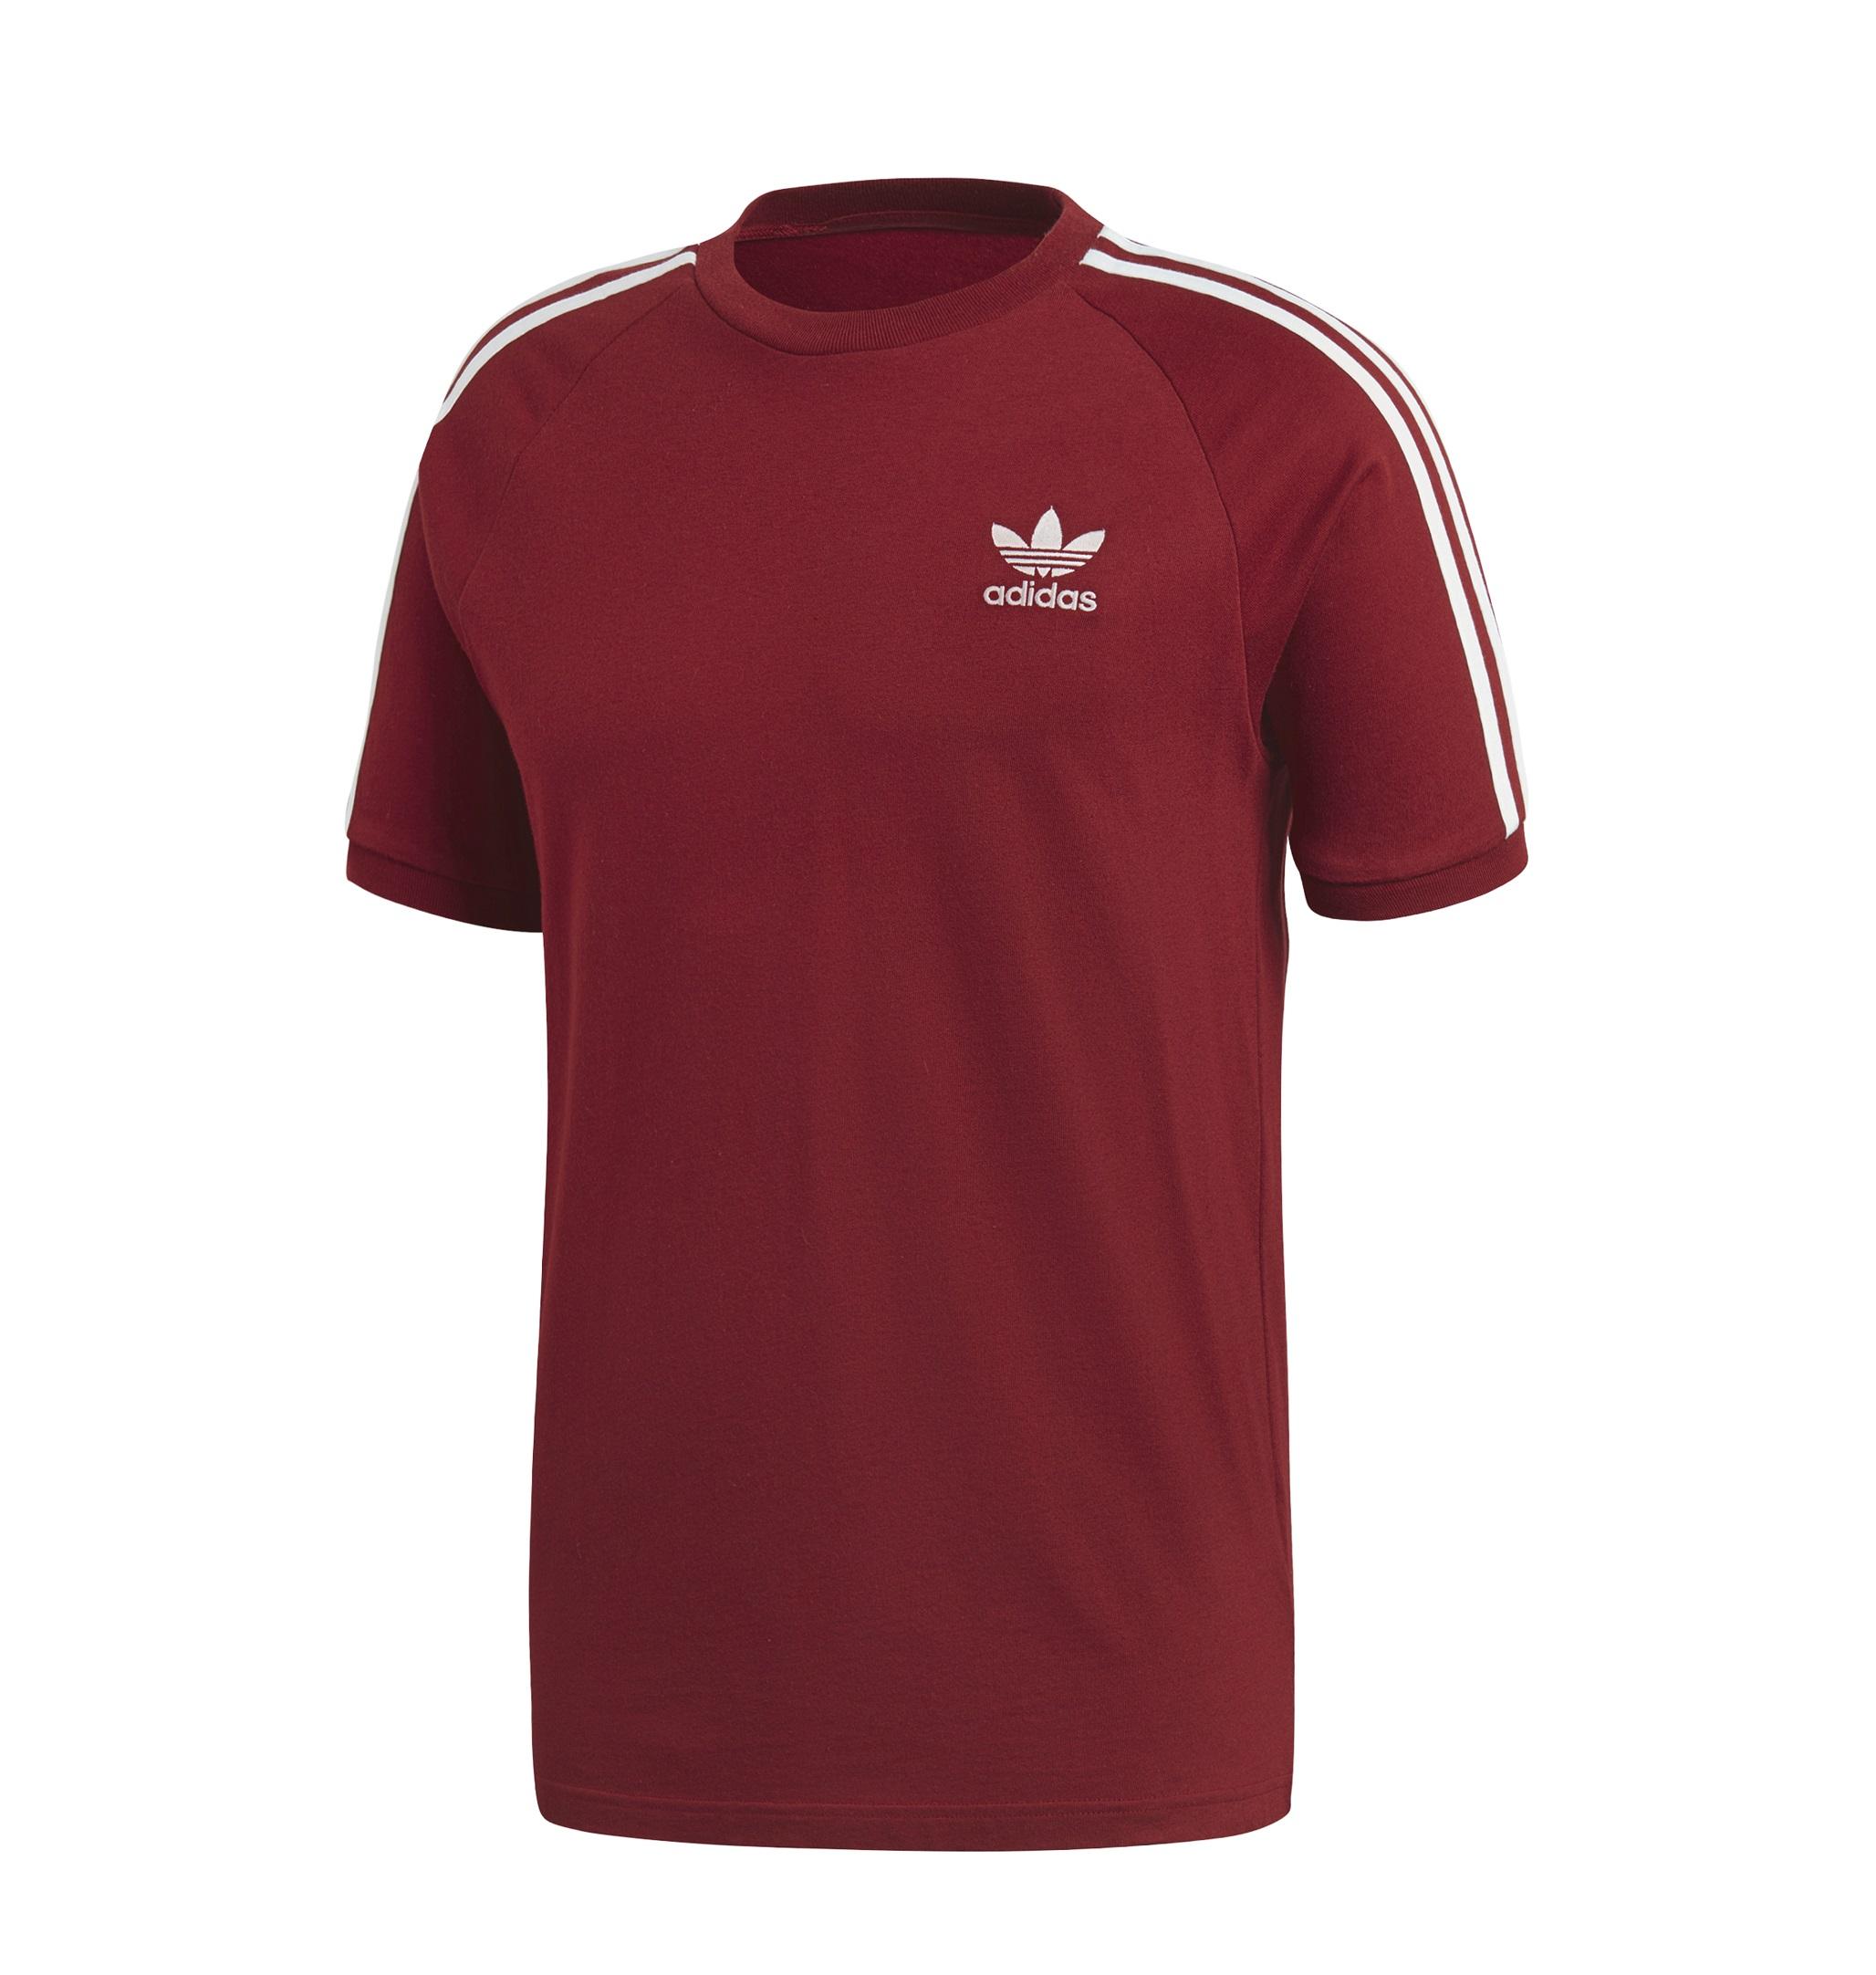 92fddb219 koszulka adidas 3-Stripes T-shirt DH5810 || timsport.pl - darmowa ...